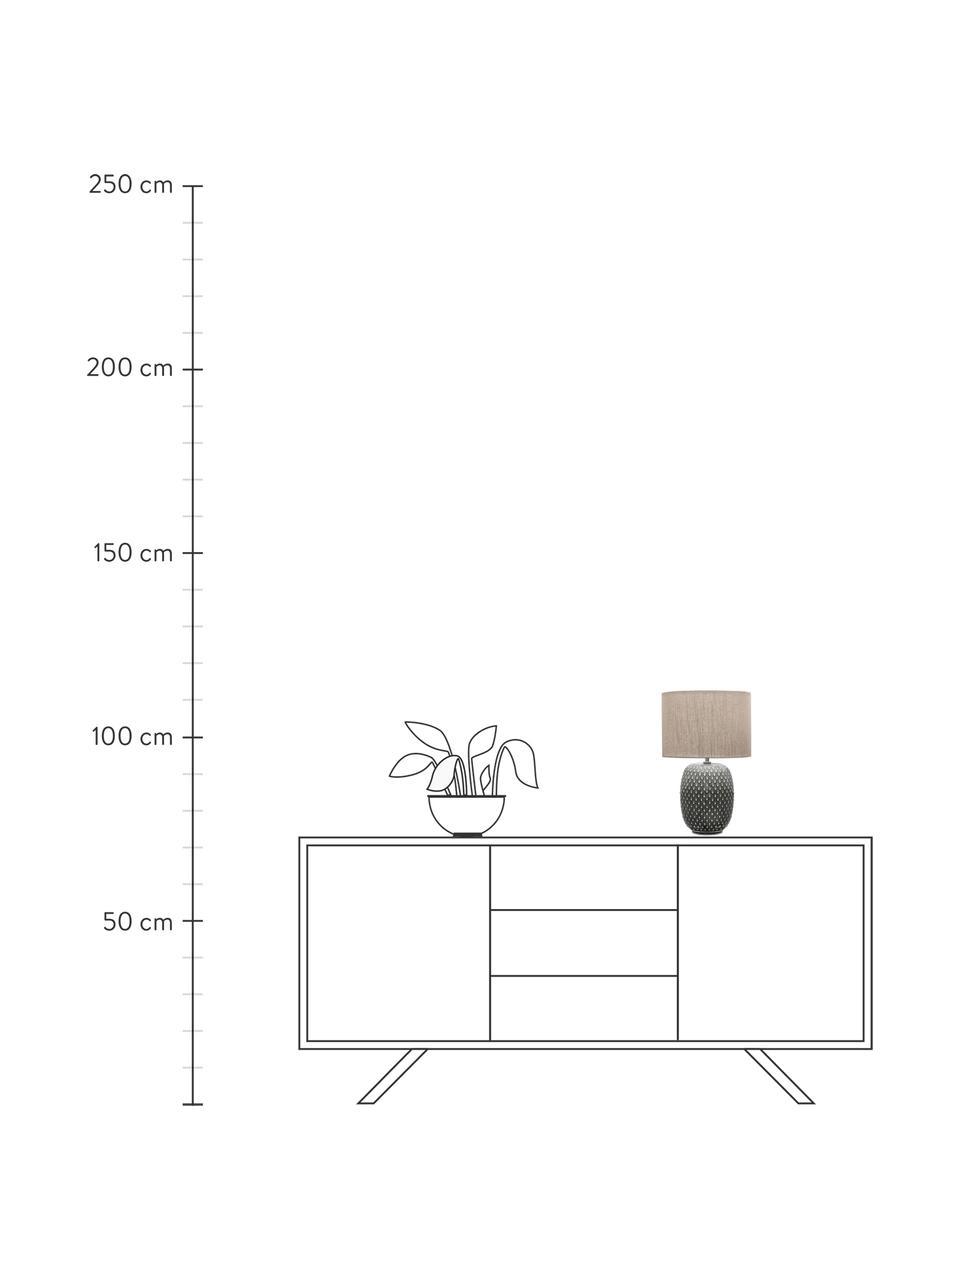 Keramik-Tischlampe Pretty Classy, Lampenschirm: Stoff, Lampenfuß: Keramik, Grau, Beige, Ø 25 x H 40 cm